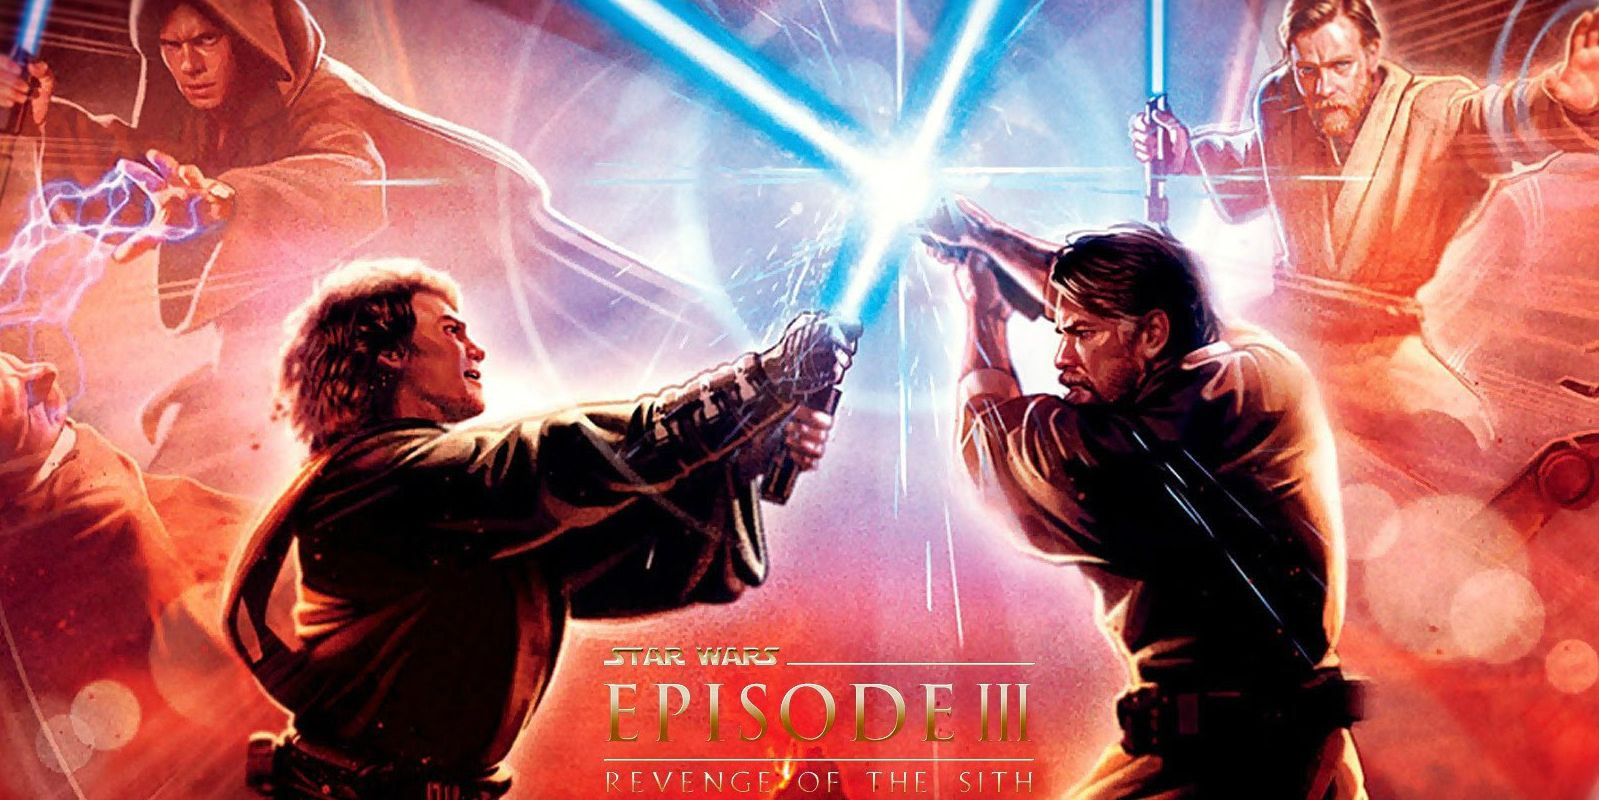 Star Wars Revenge Of The Sith Left Out Its Coolest Lightsaber Battle